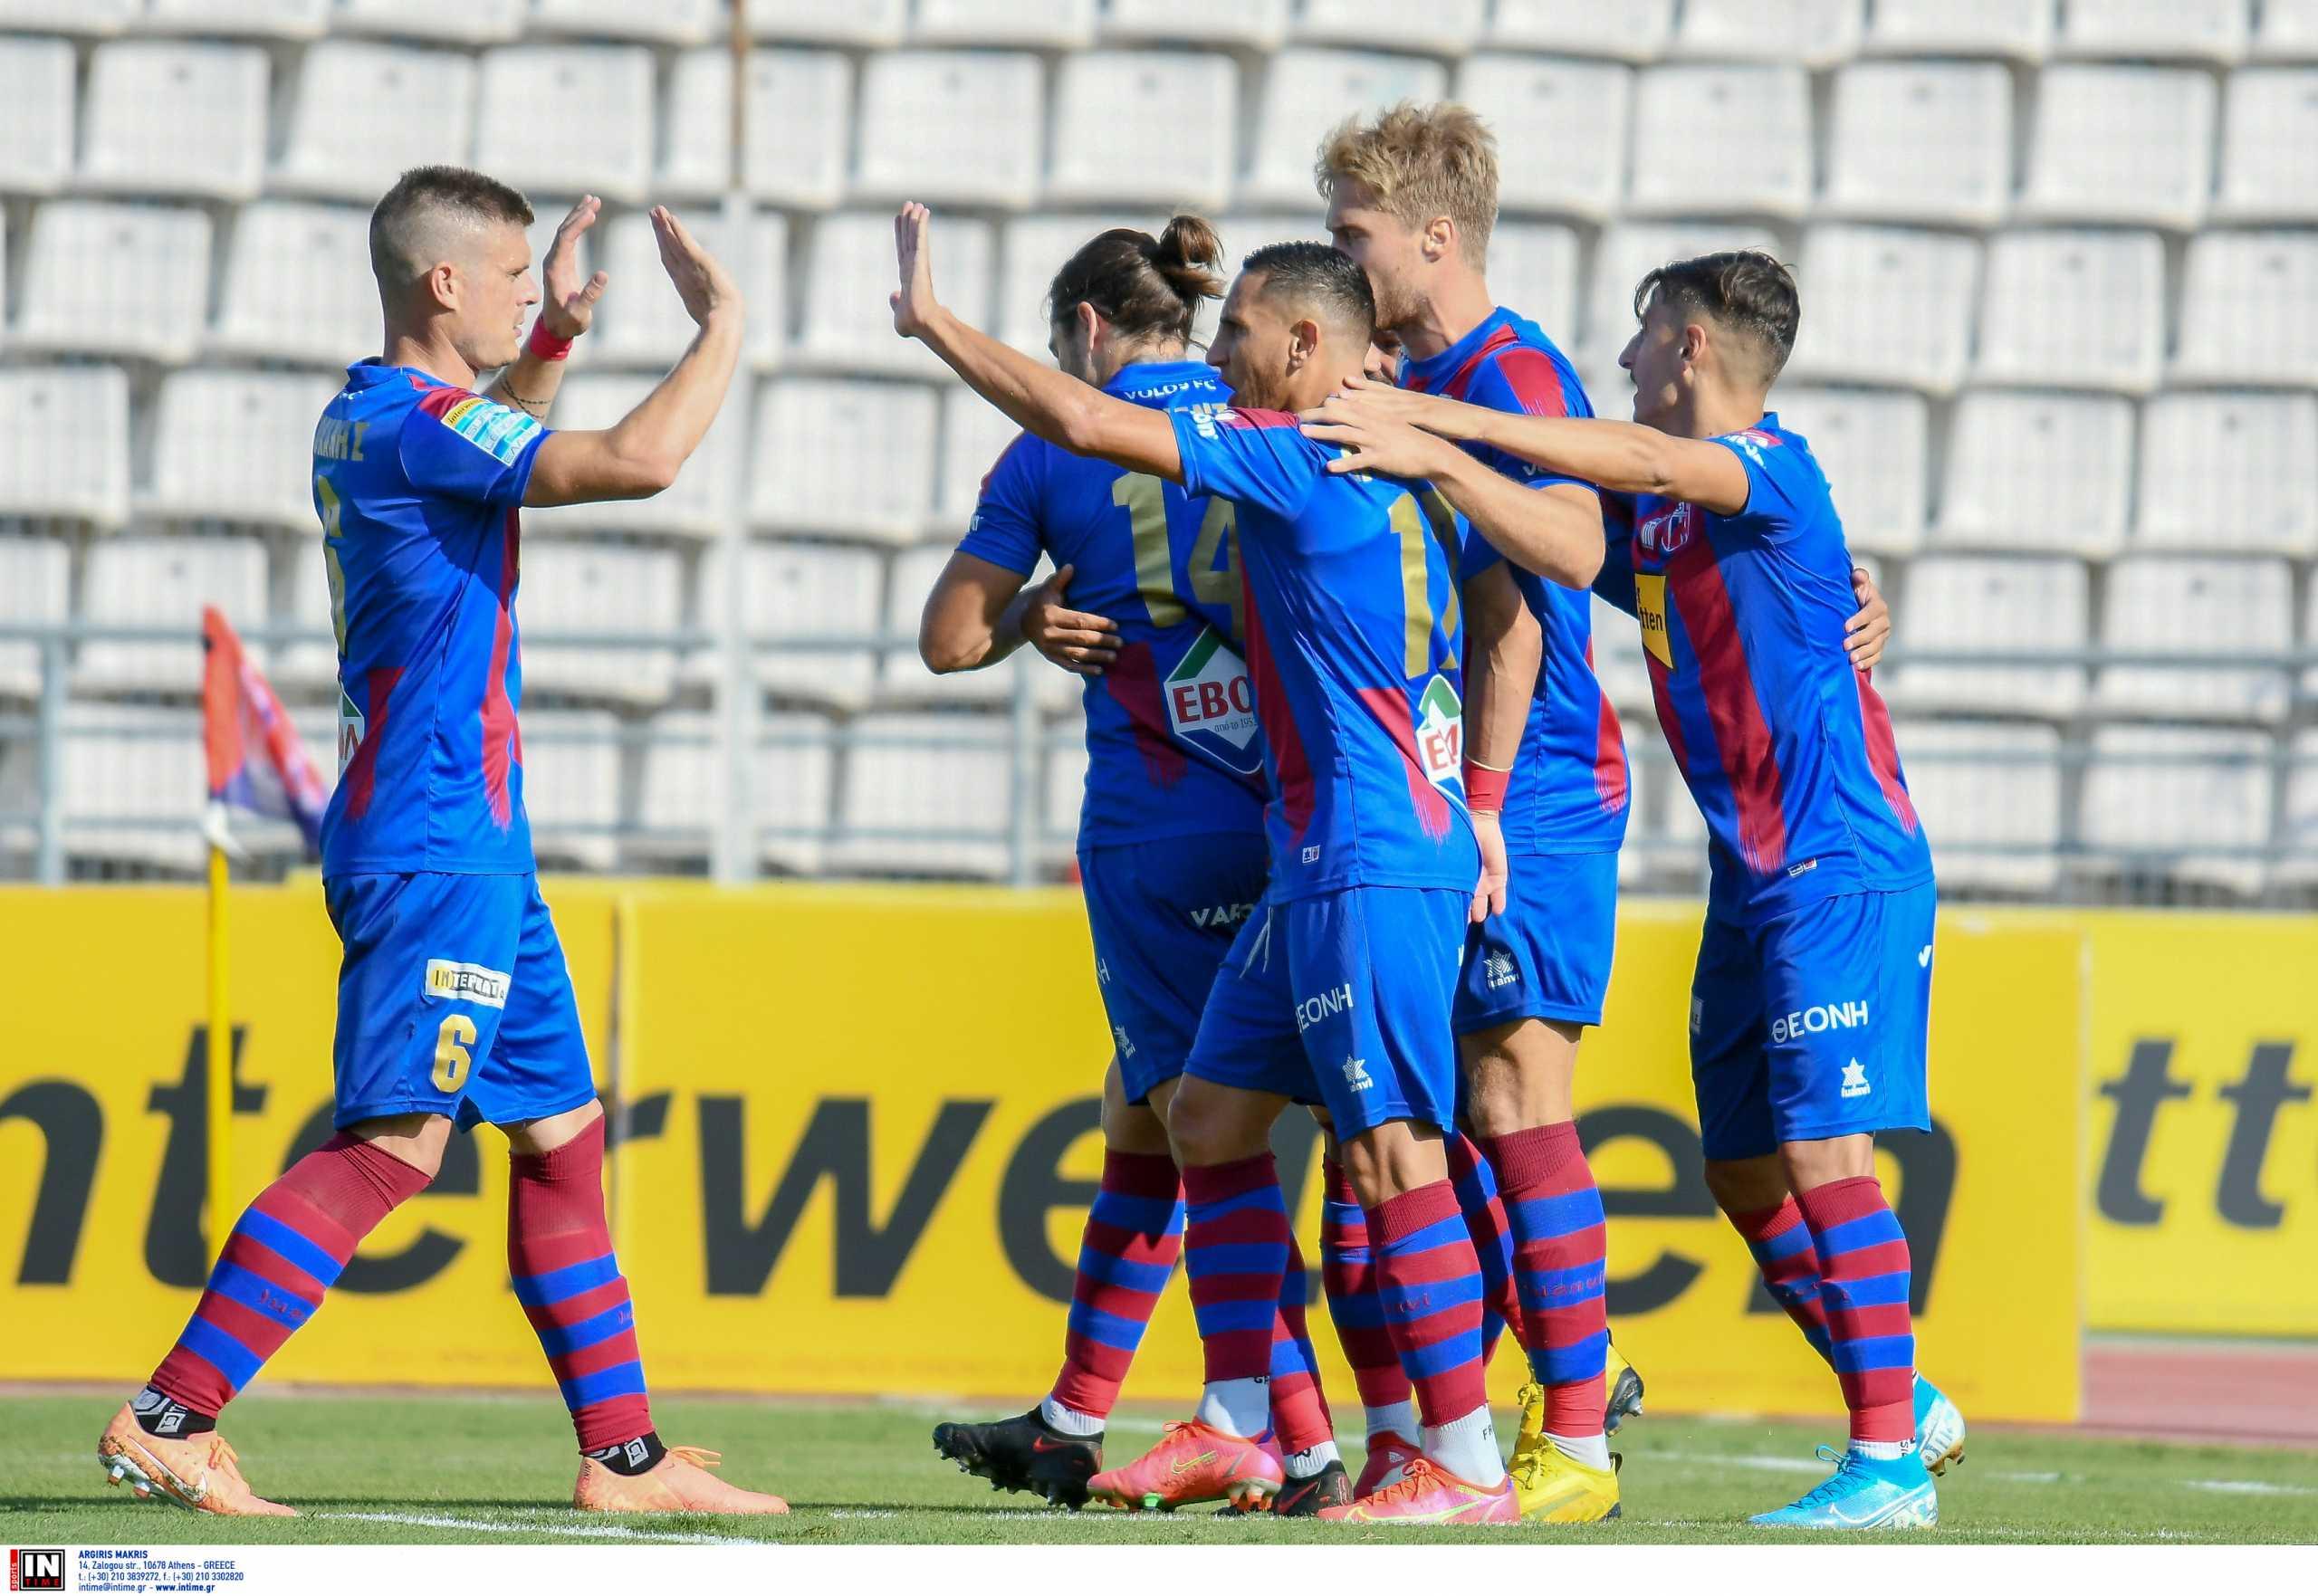 Superleague 1, Βόλος – Αστέρας Τρίπολης 2-1: Επιστροφή στις νίκες για τους Θεσσαλούς